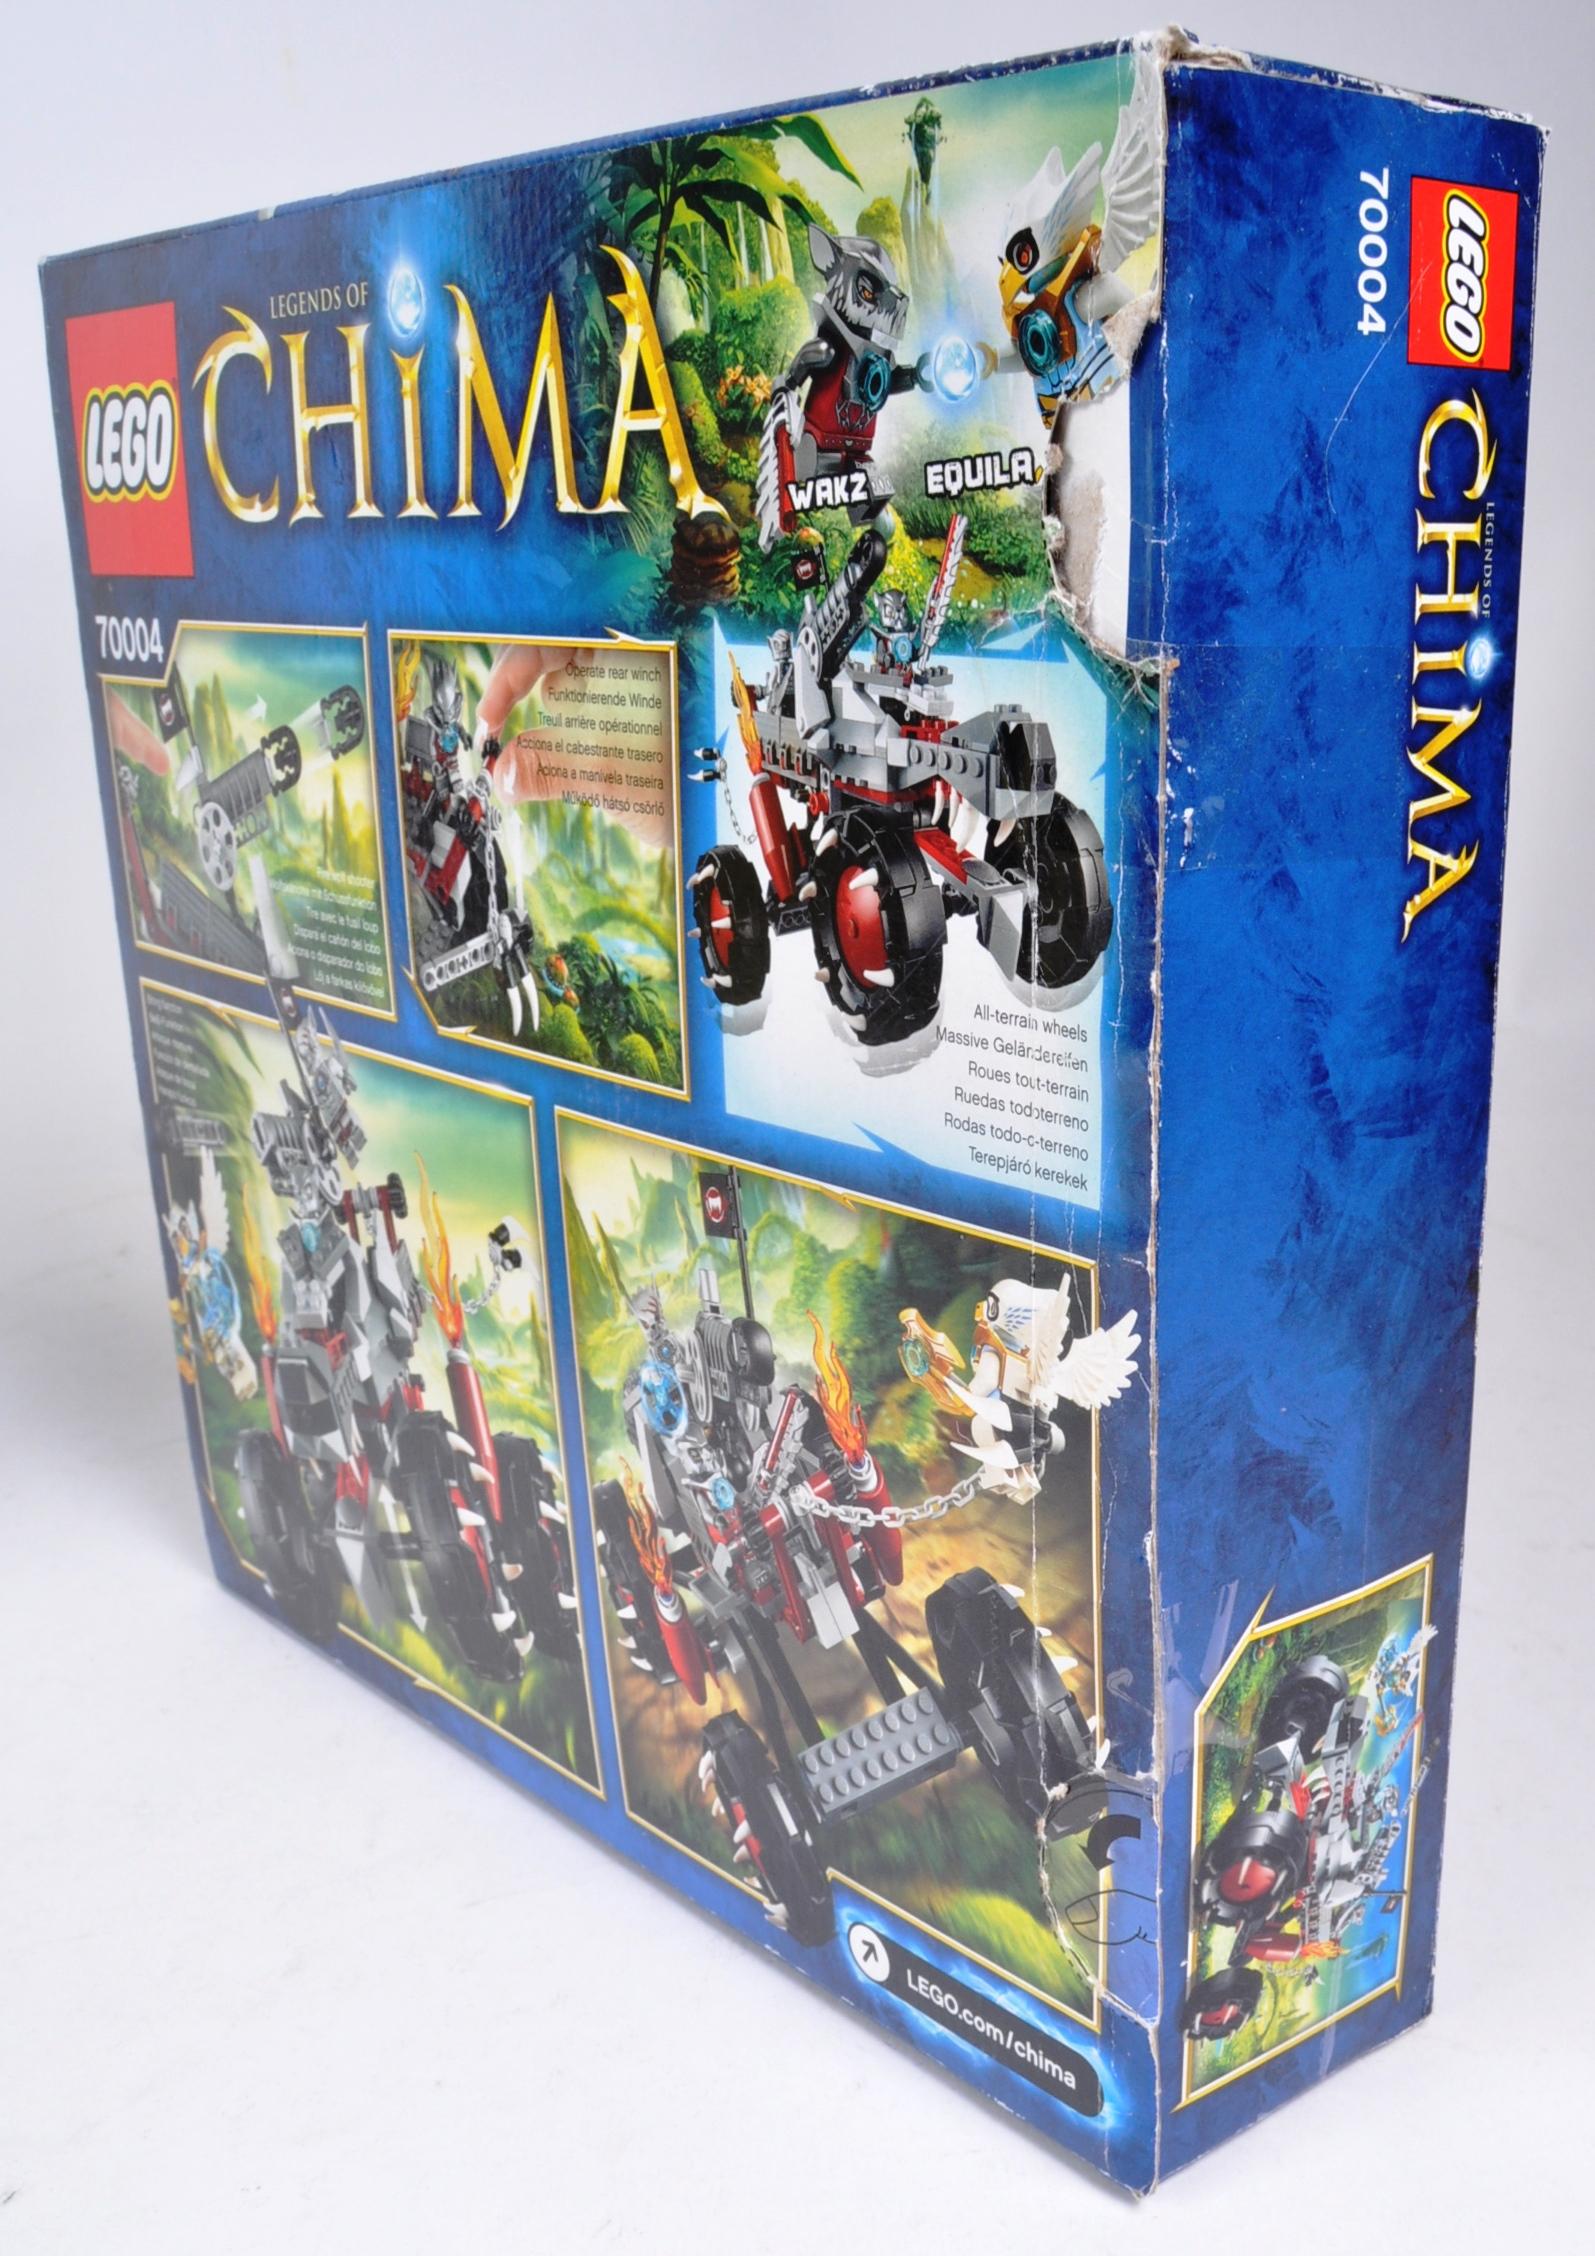 LEGO SETS - LEGENDS OF CHIMA - 70004 / 70132 - Image 3 of 6